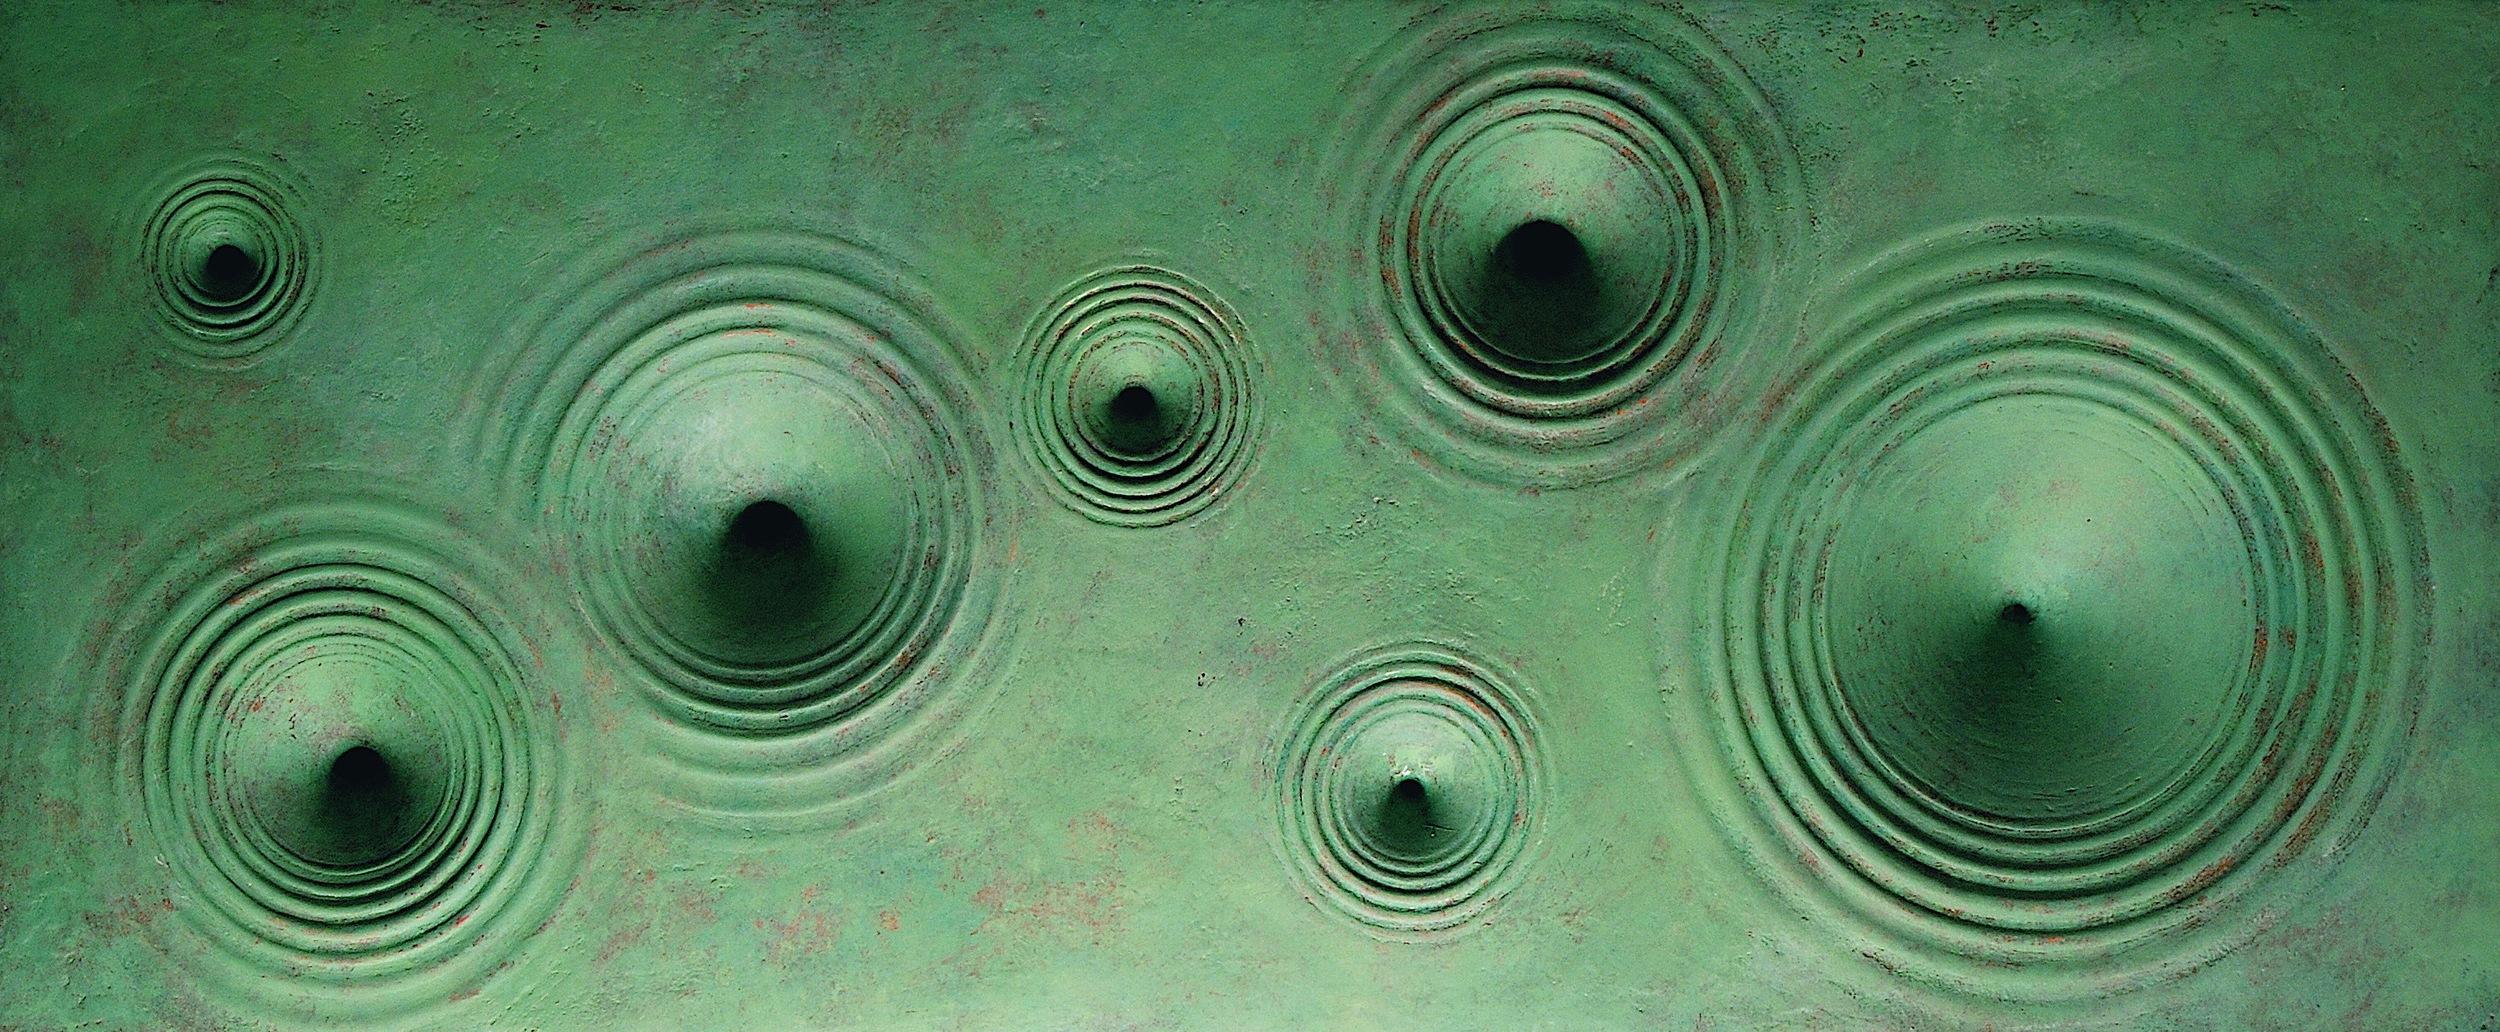 "Thomas Coffin - Vortex (green), 14""h x 30""w x 3""d, mixed media sculptural wall relief"